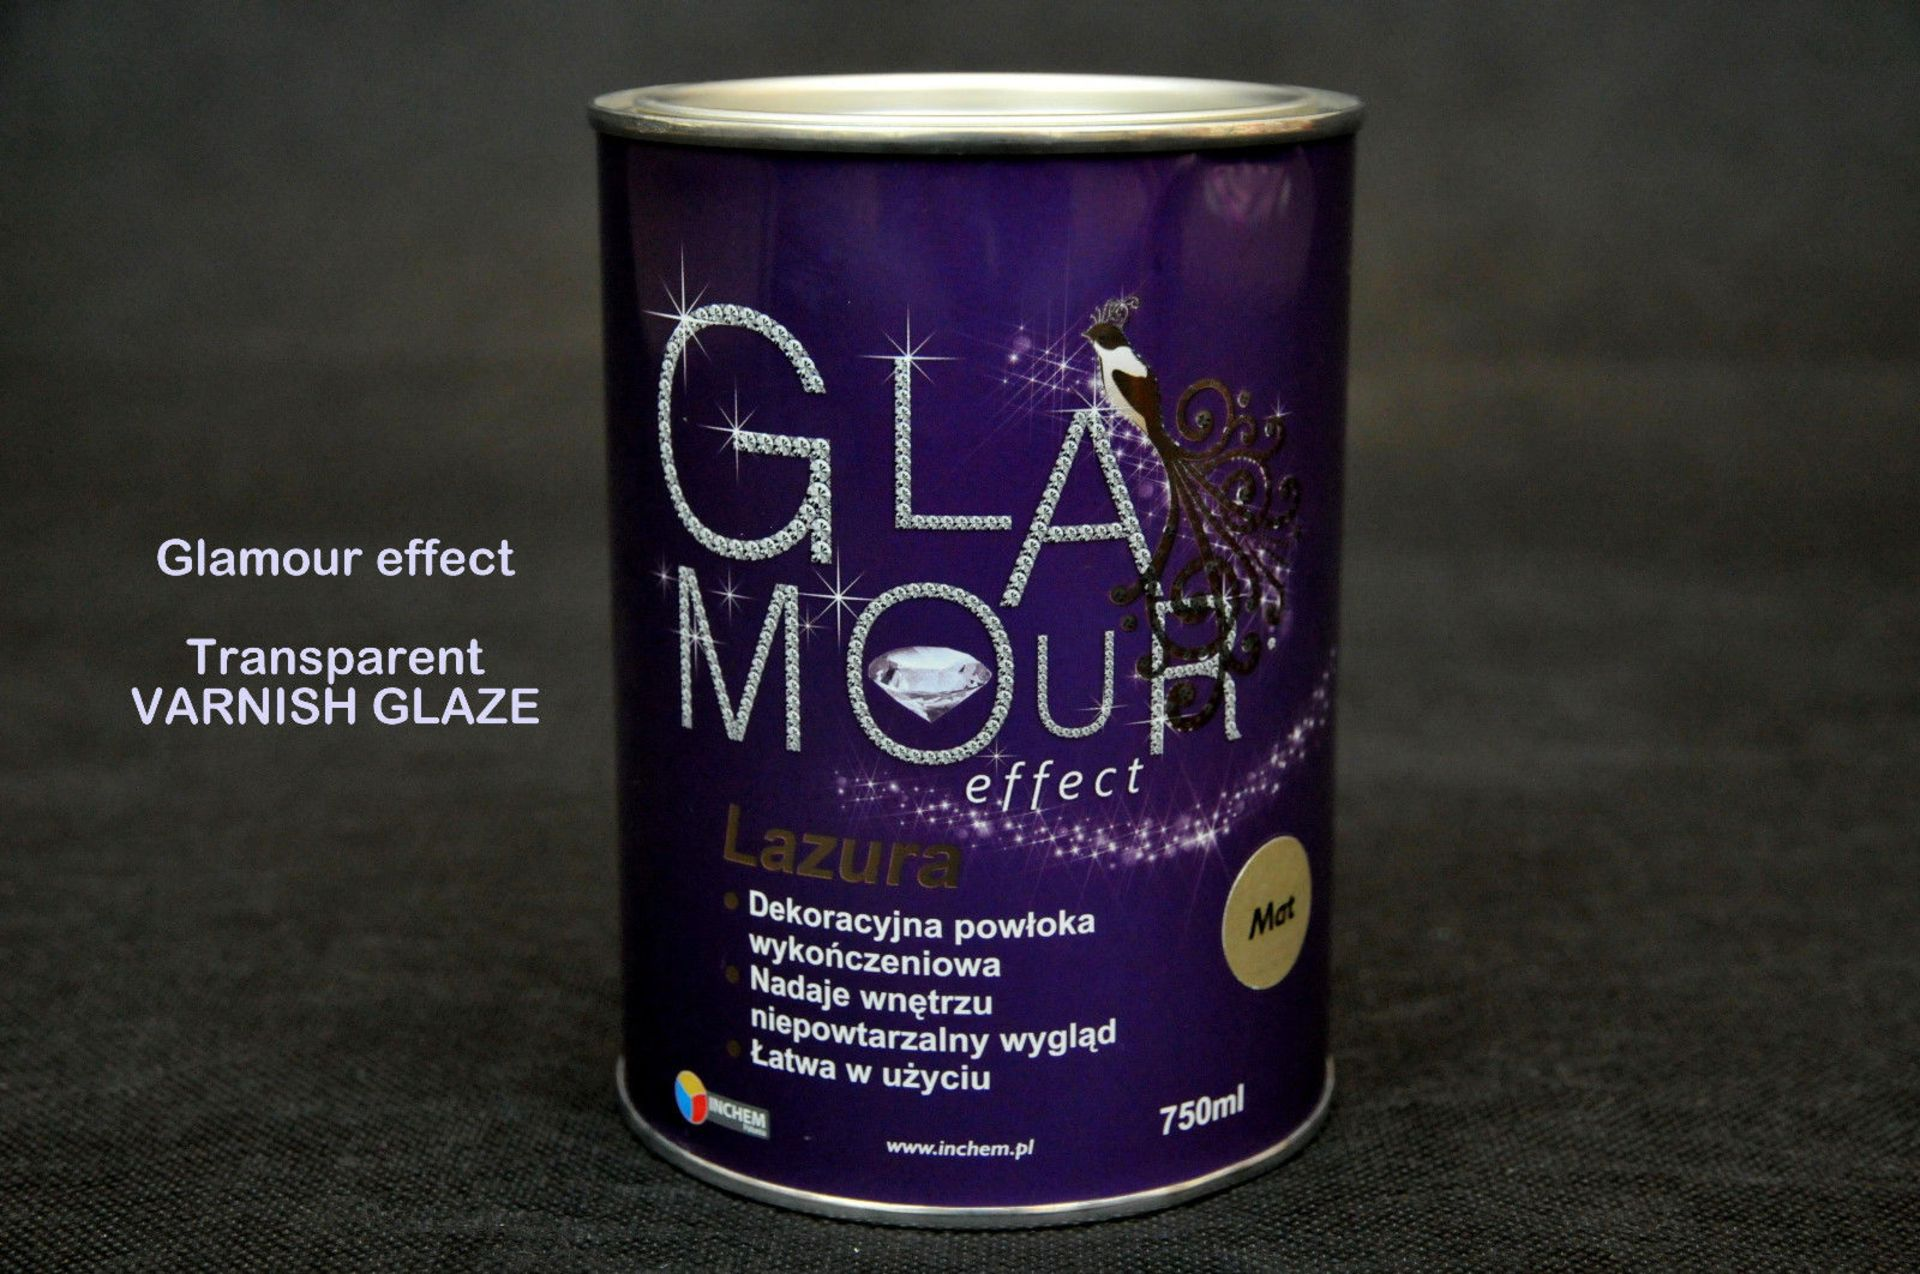 Pallet containing 432 tins Brand new 750ml - Sealed Lazura High Quality Gloss Finish Varnish Glaze